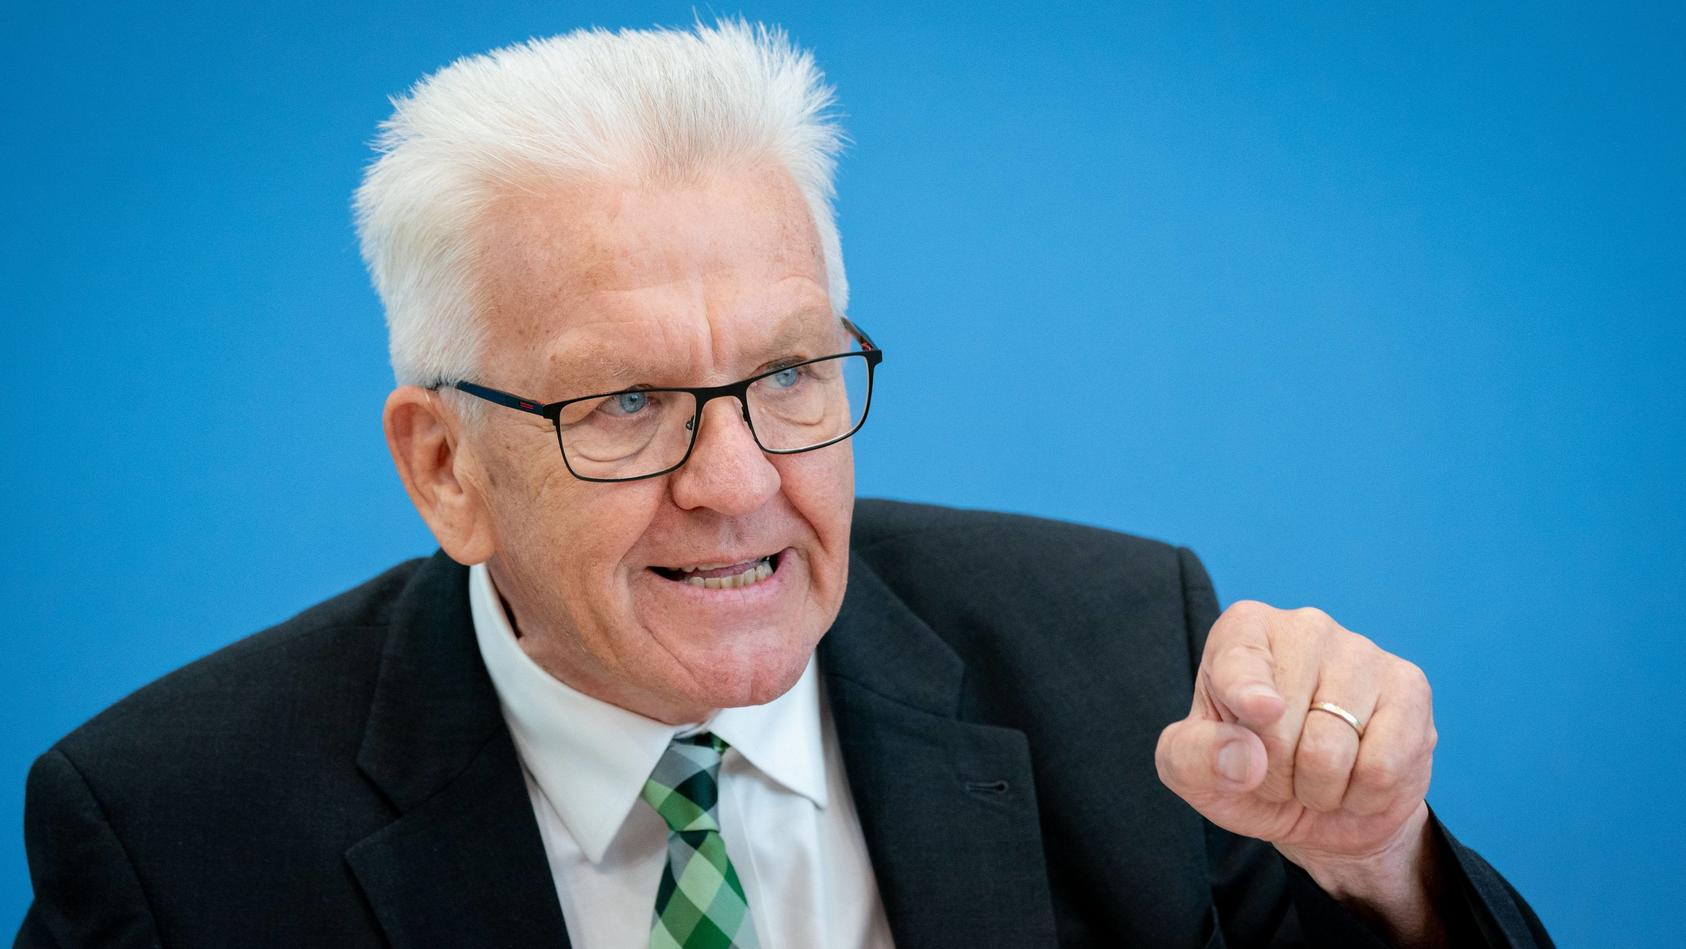 Winfried Kretschmann ist der beliebteste Ministerpräsident Deutschlands.